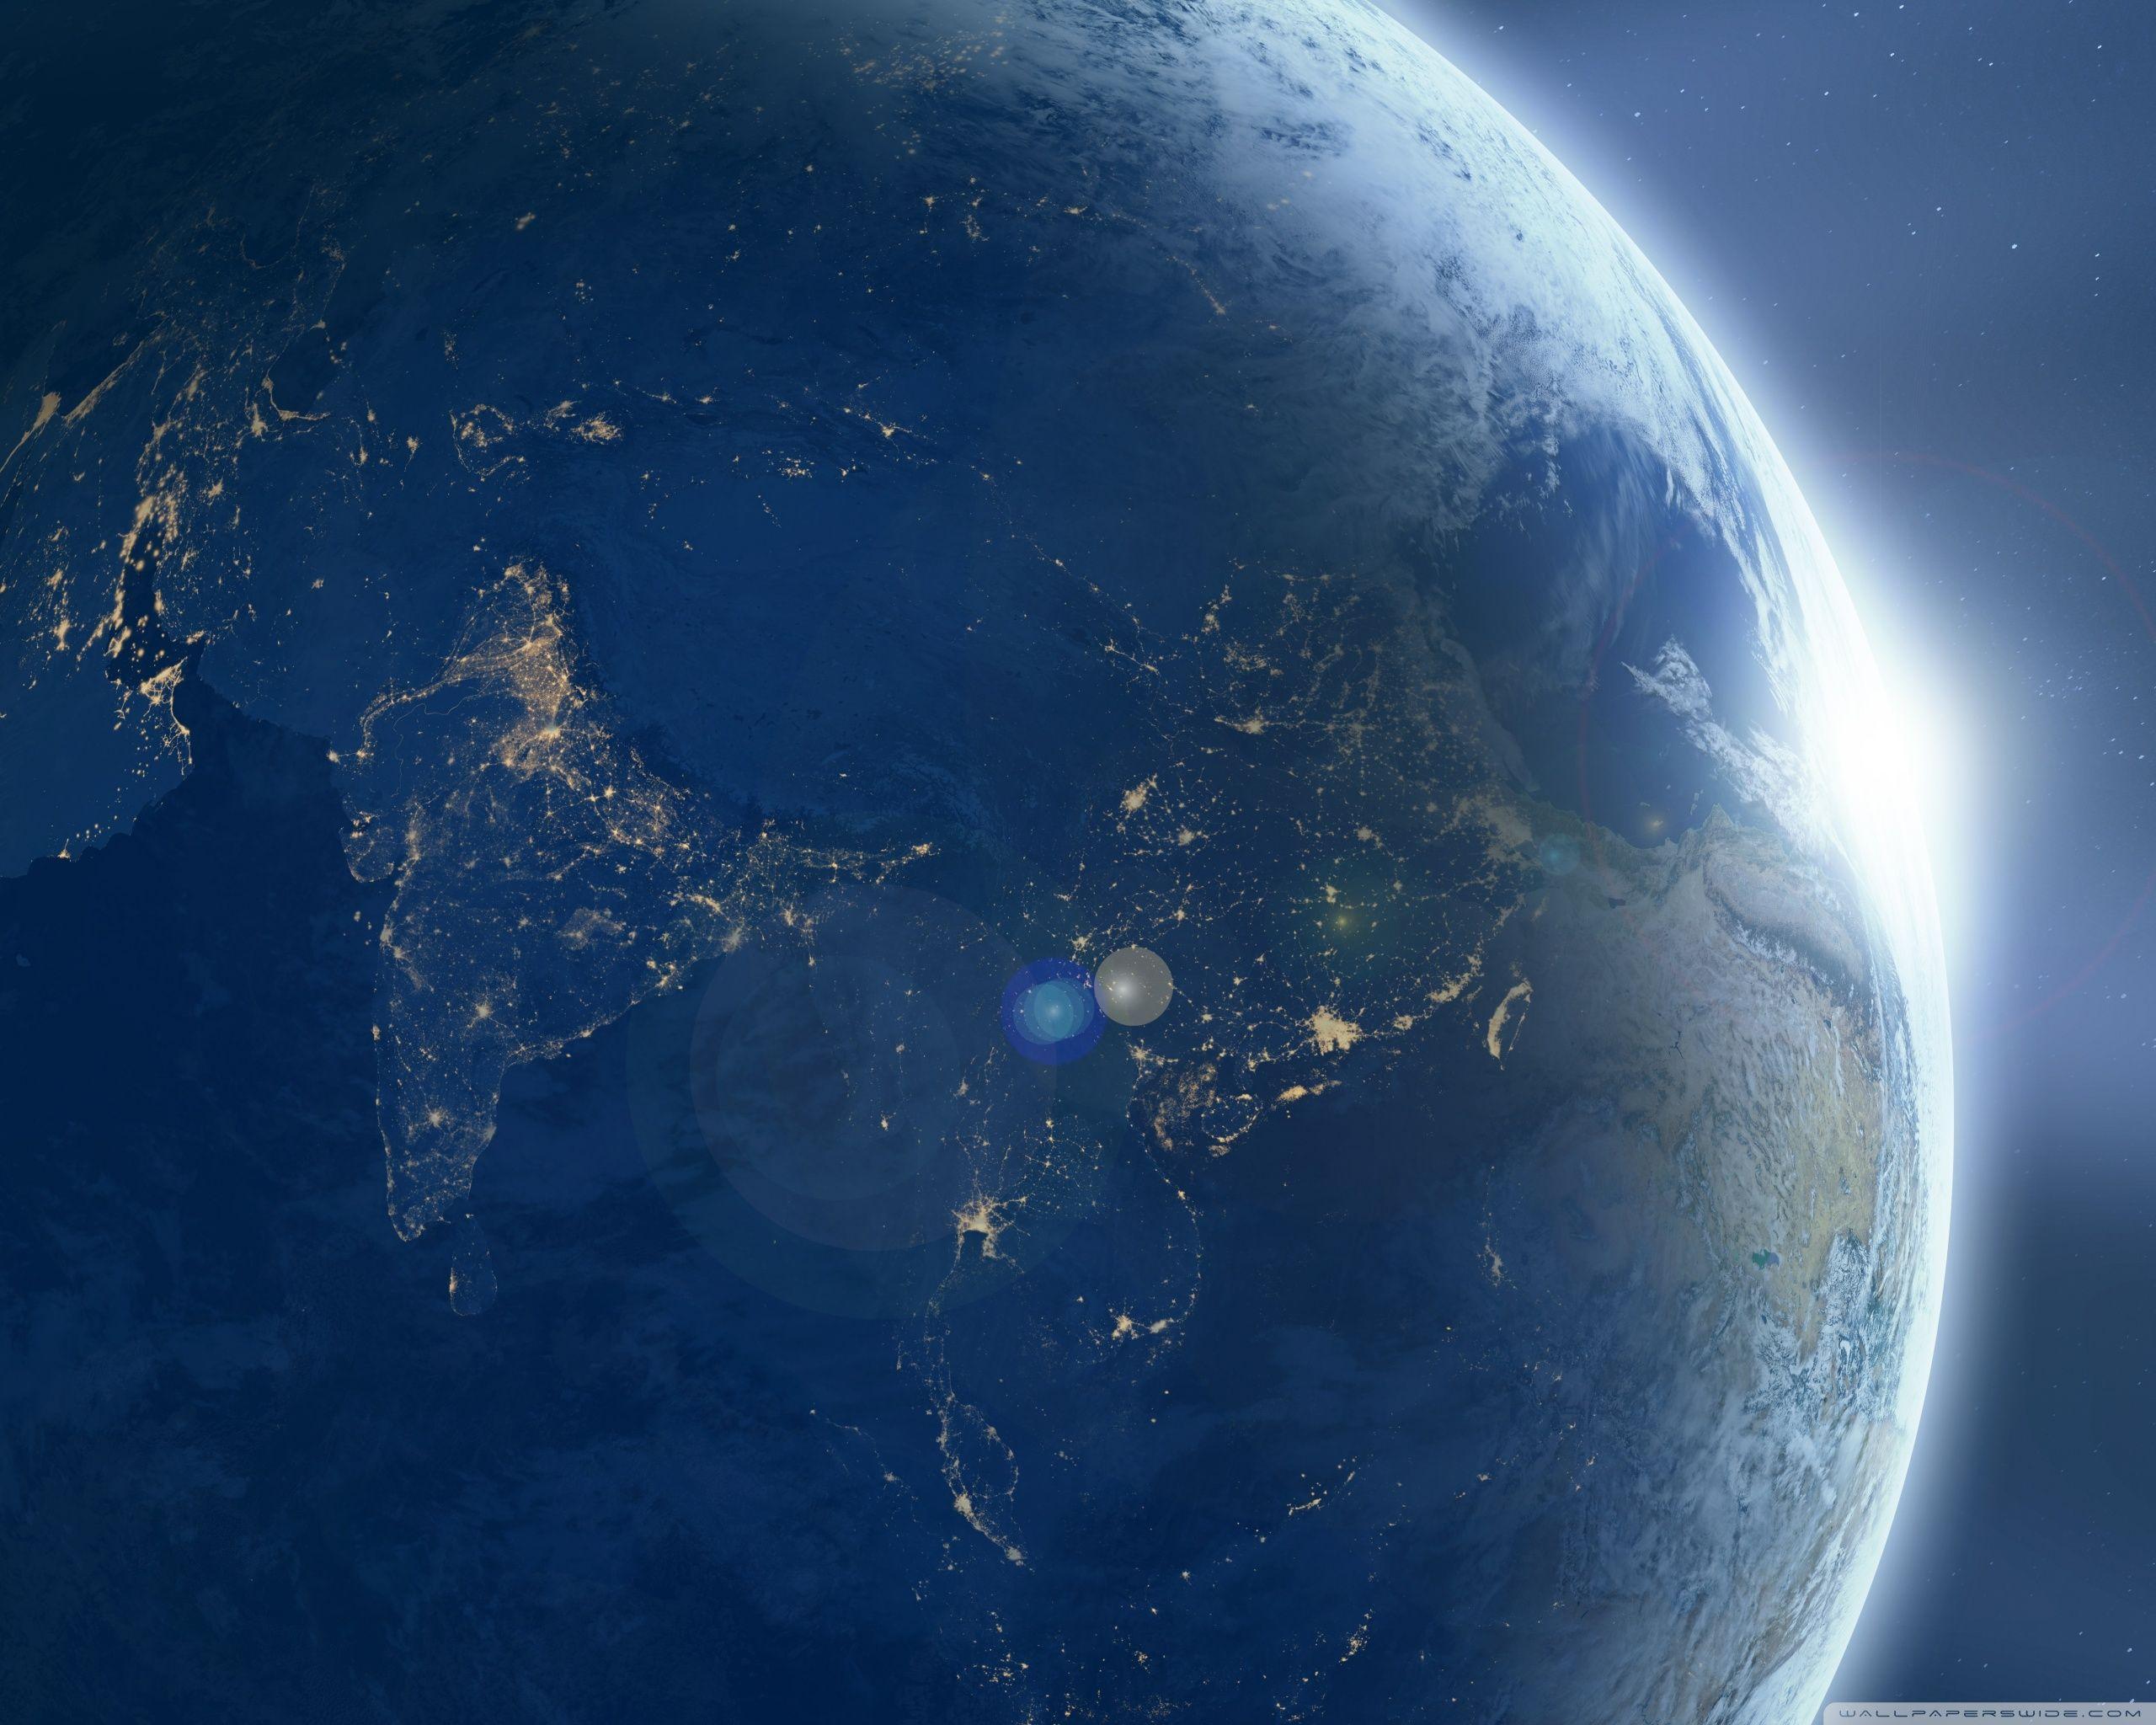 Moon Orbiting Earth HD desktop wallpaper Widescreen Mobile